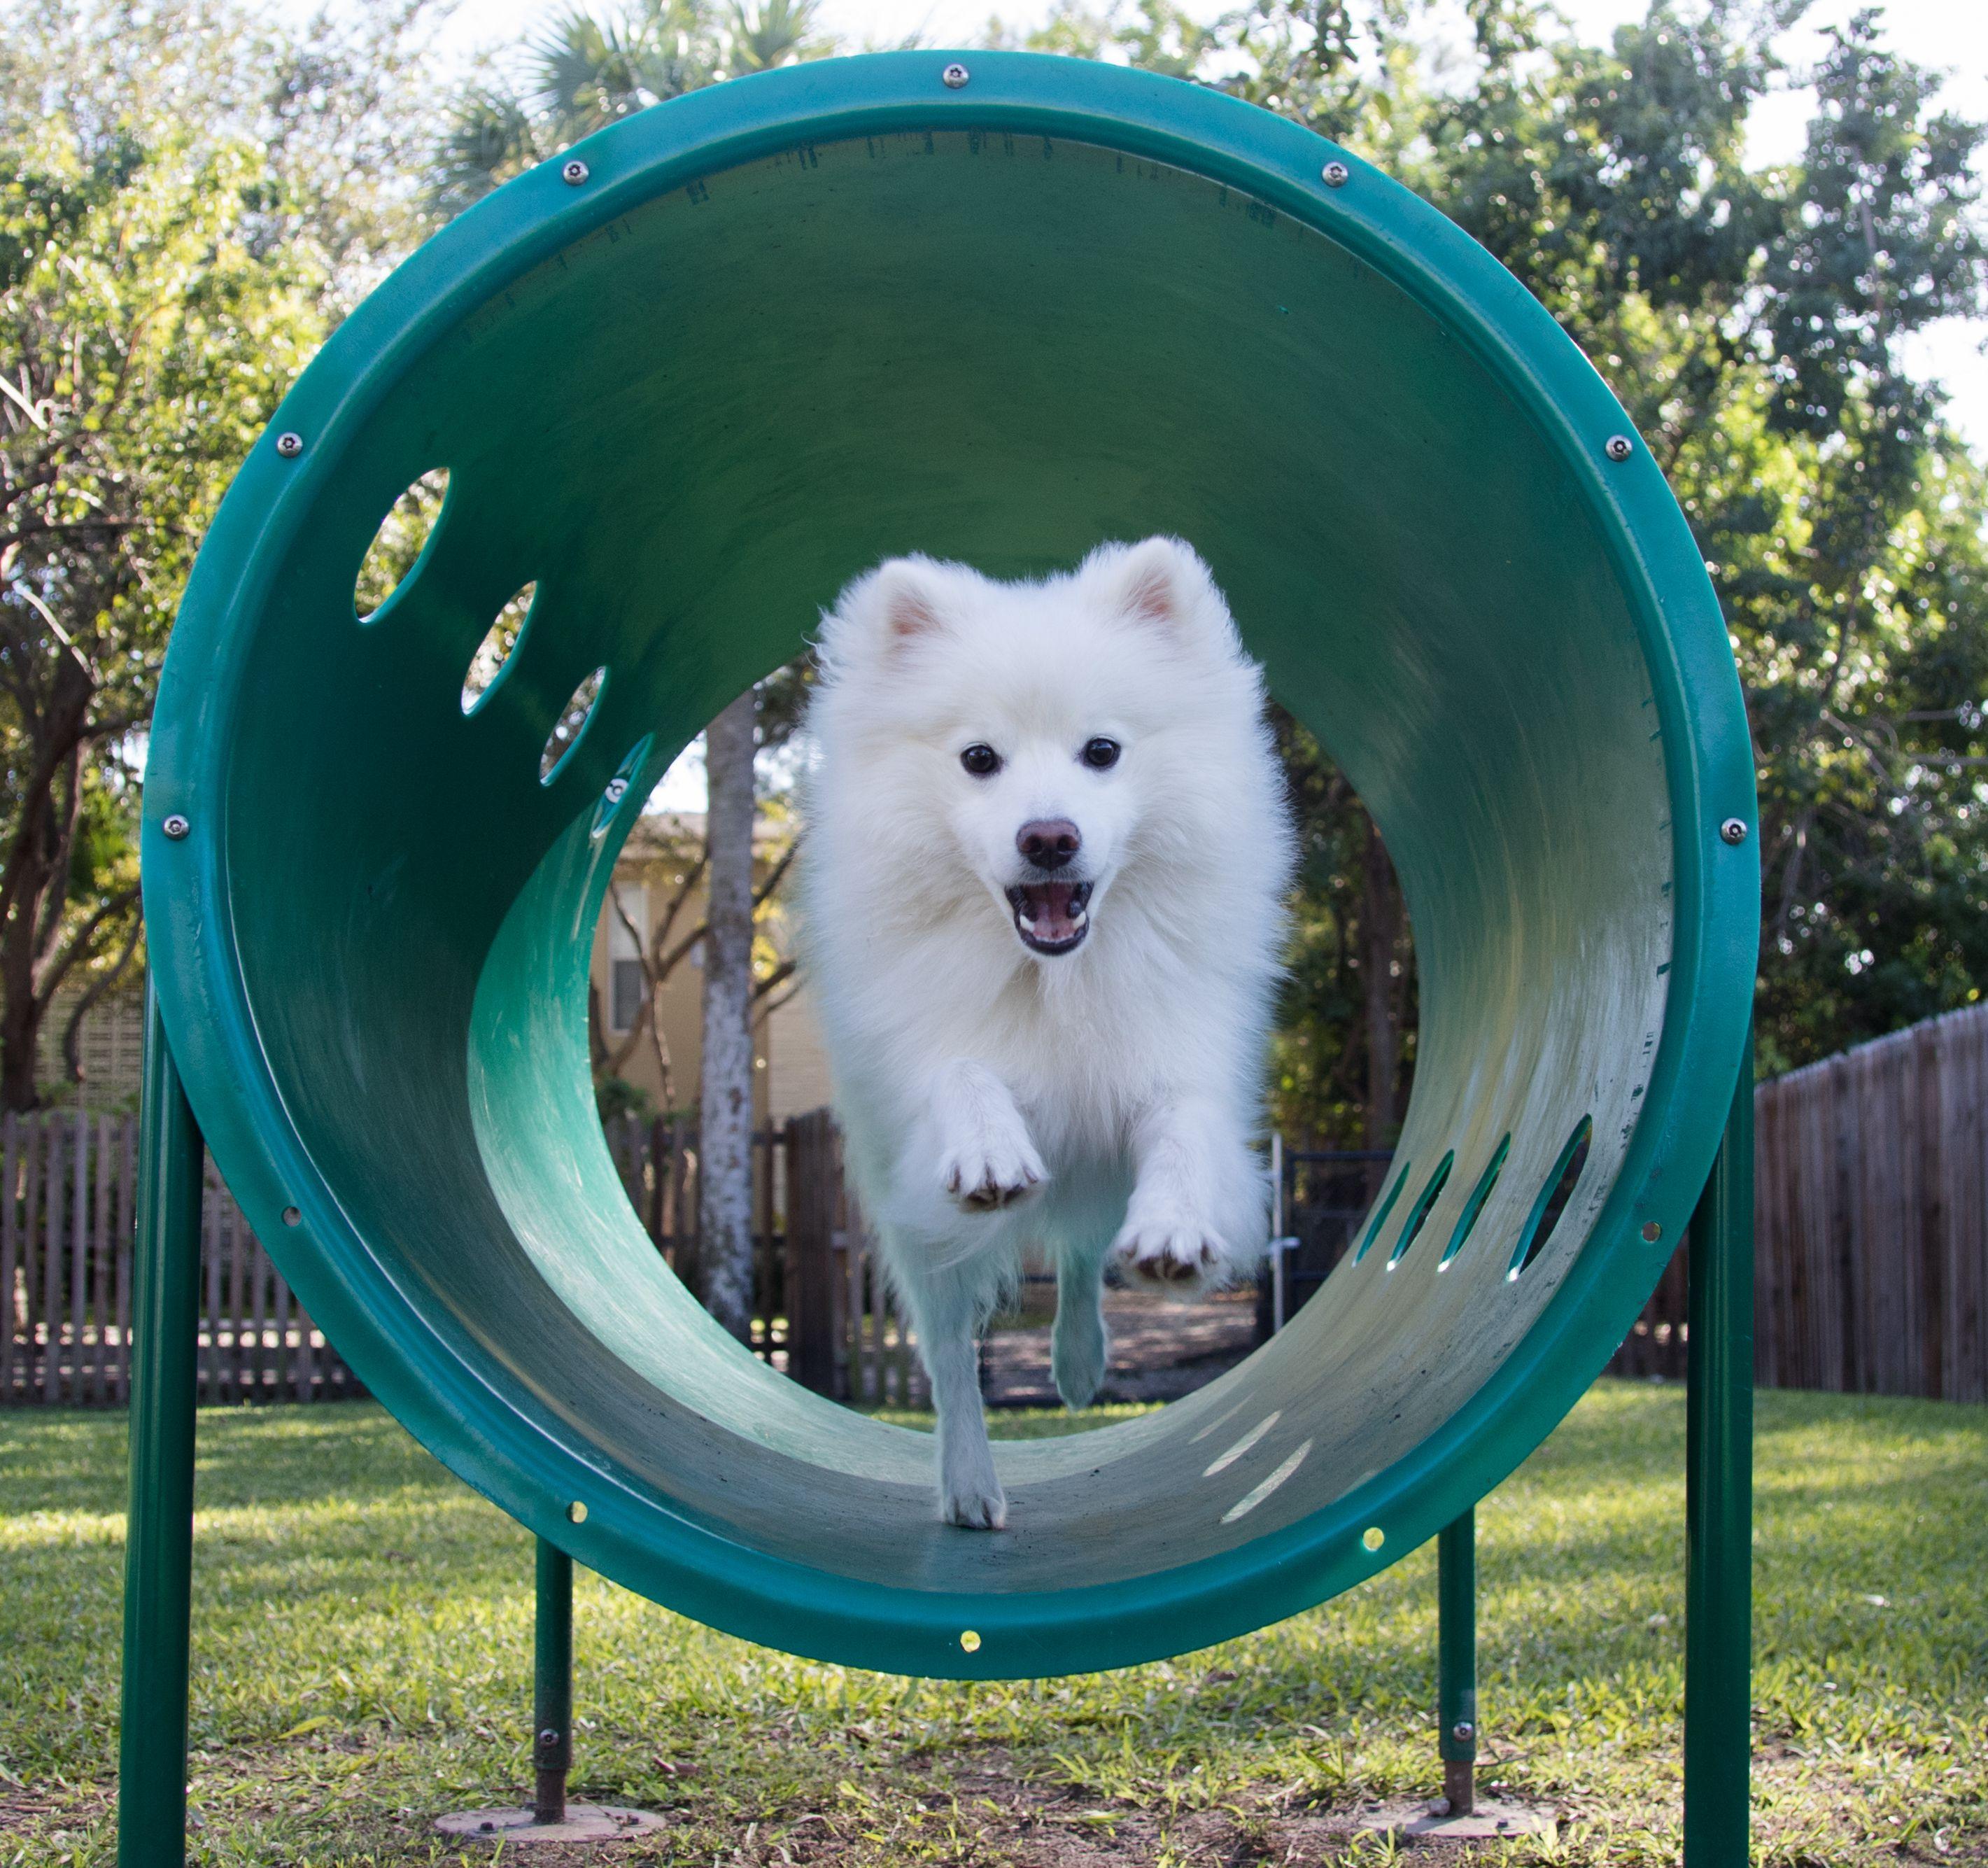 American eskimo dog on agility equipment at park